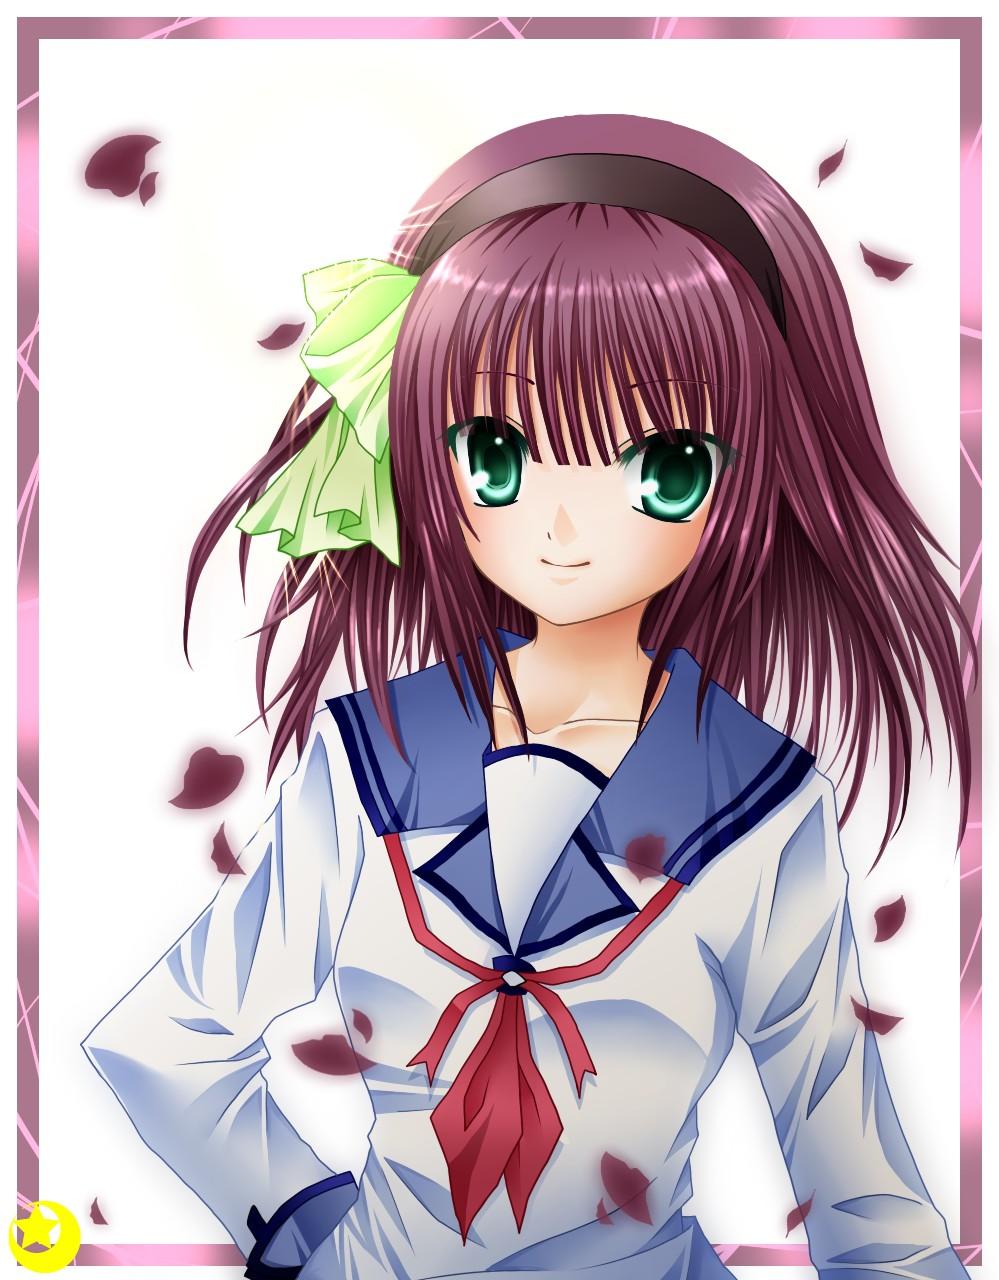 Nakamura Yuri - Angel Beats! - Image #1110624 - Zerochan